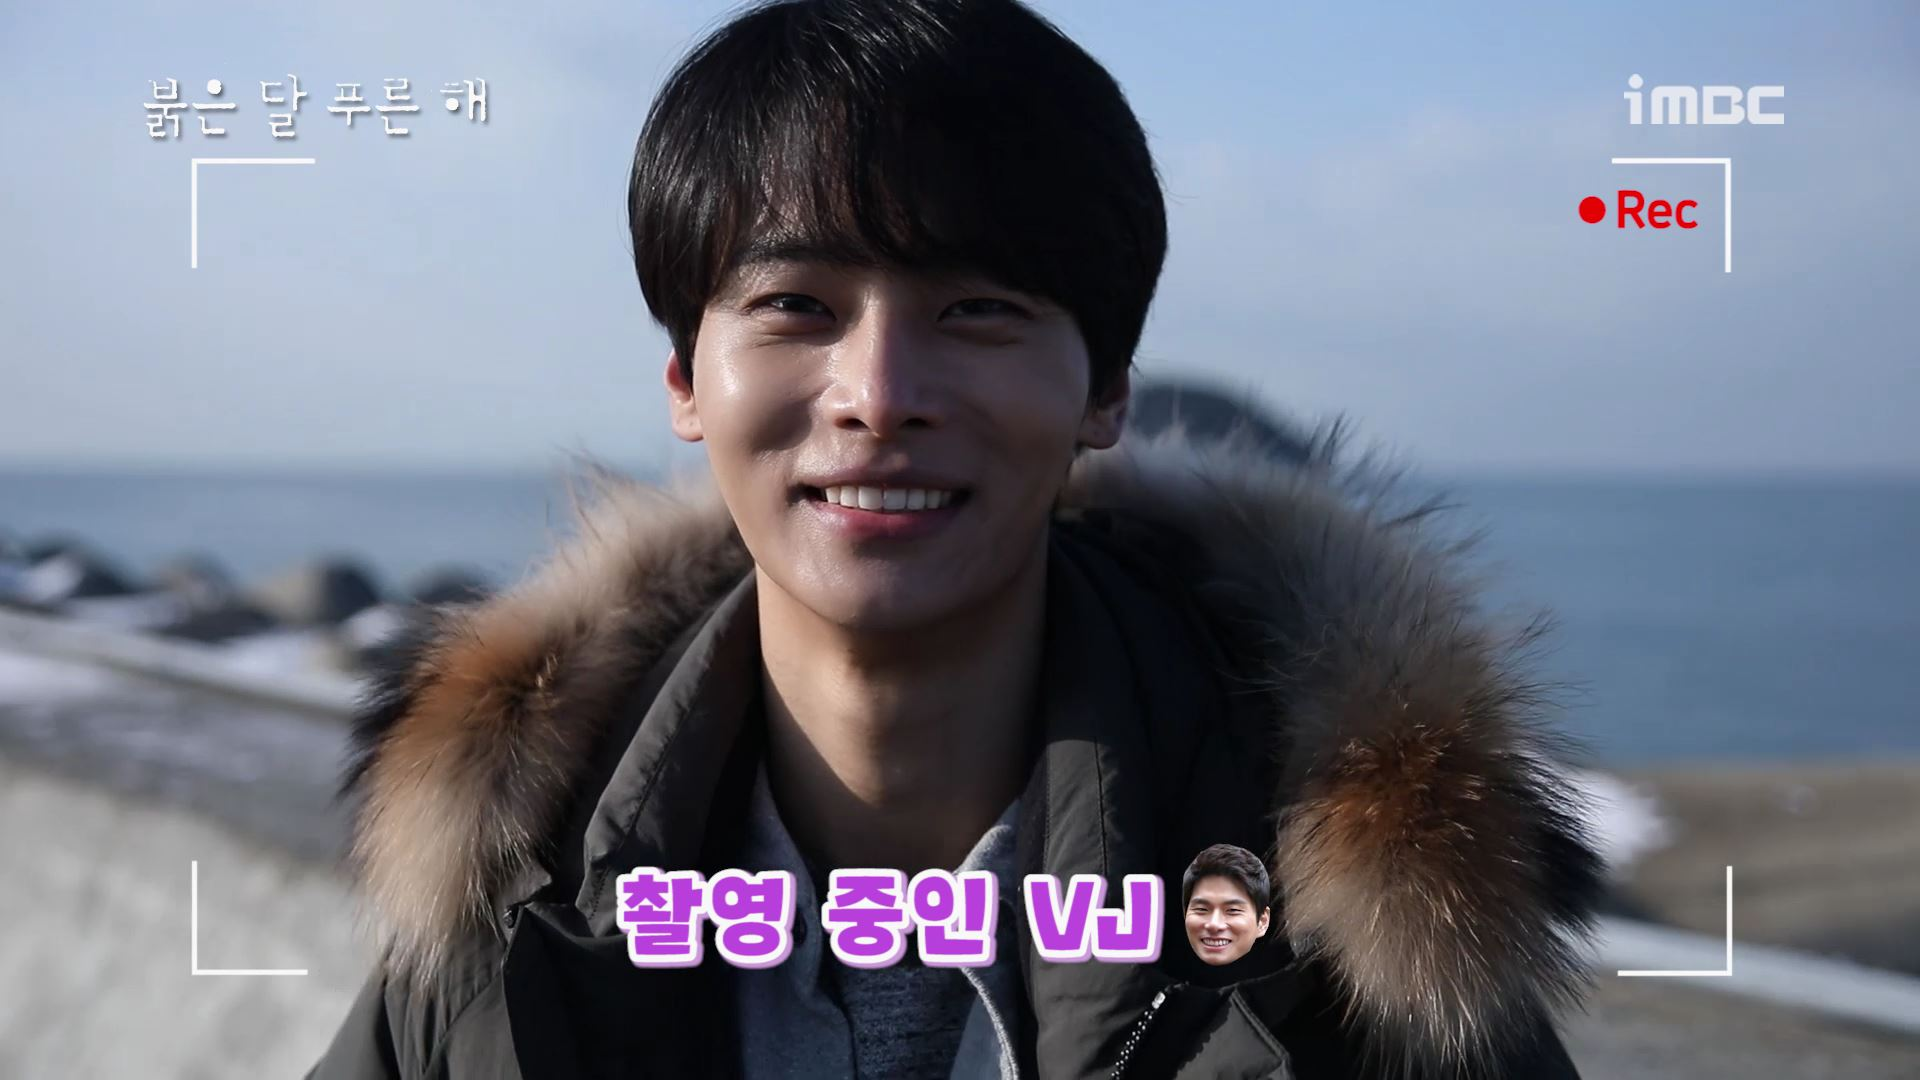 [M플레이] VJ 이이경-머드남 차학연, '붉은 달 푸른 해' 환상의 짝꿍 (feat. 보령 이행시)